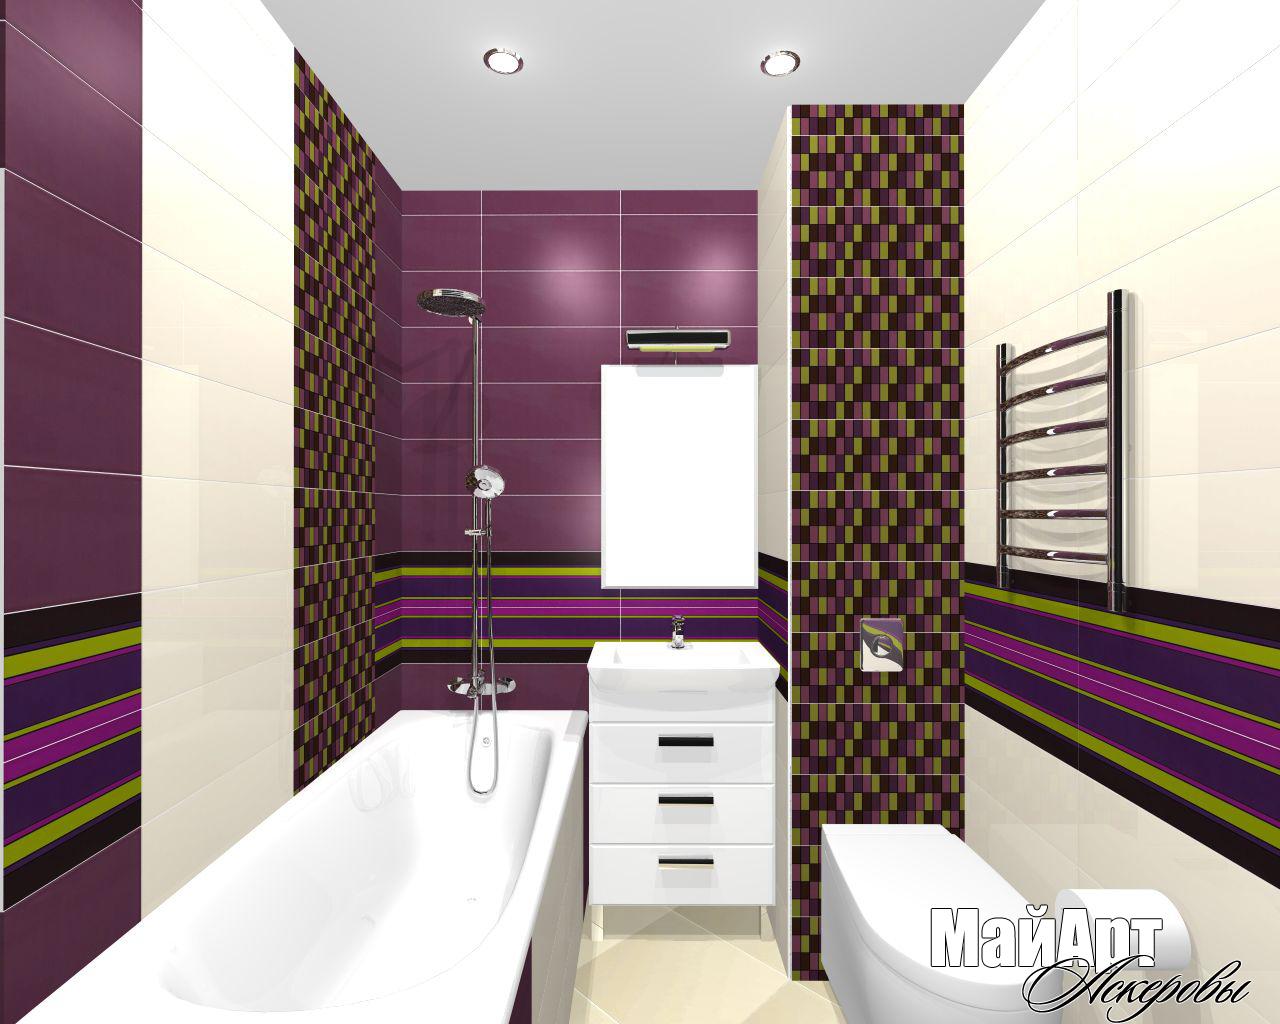 Ванная комната (Теплый стан) 1,5х1,8м . Плитка Aleluia Ceramicas  Spoony (цвет Jummy)